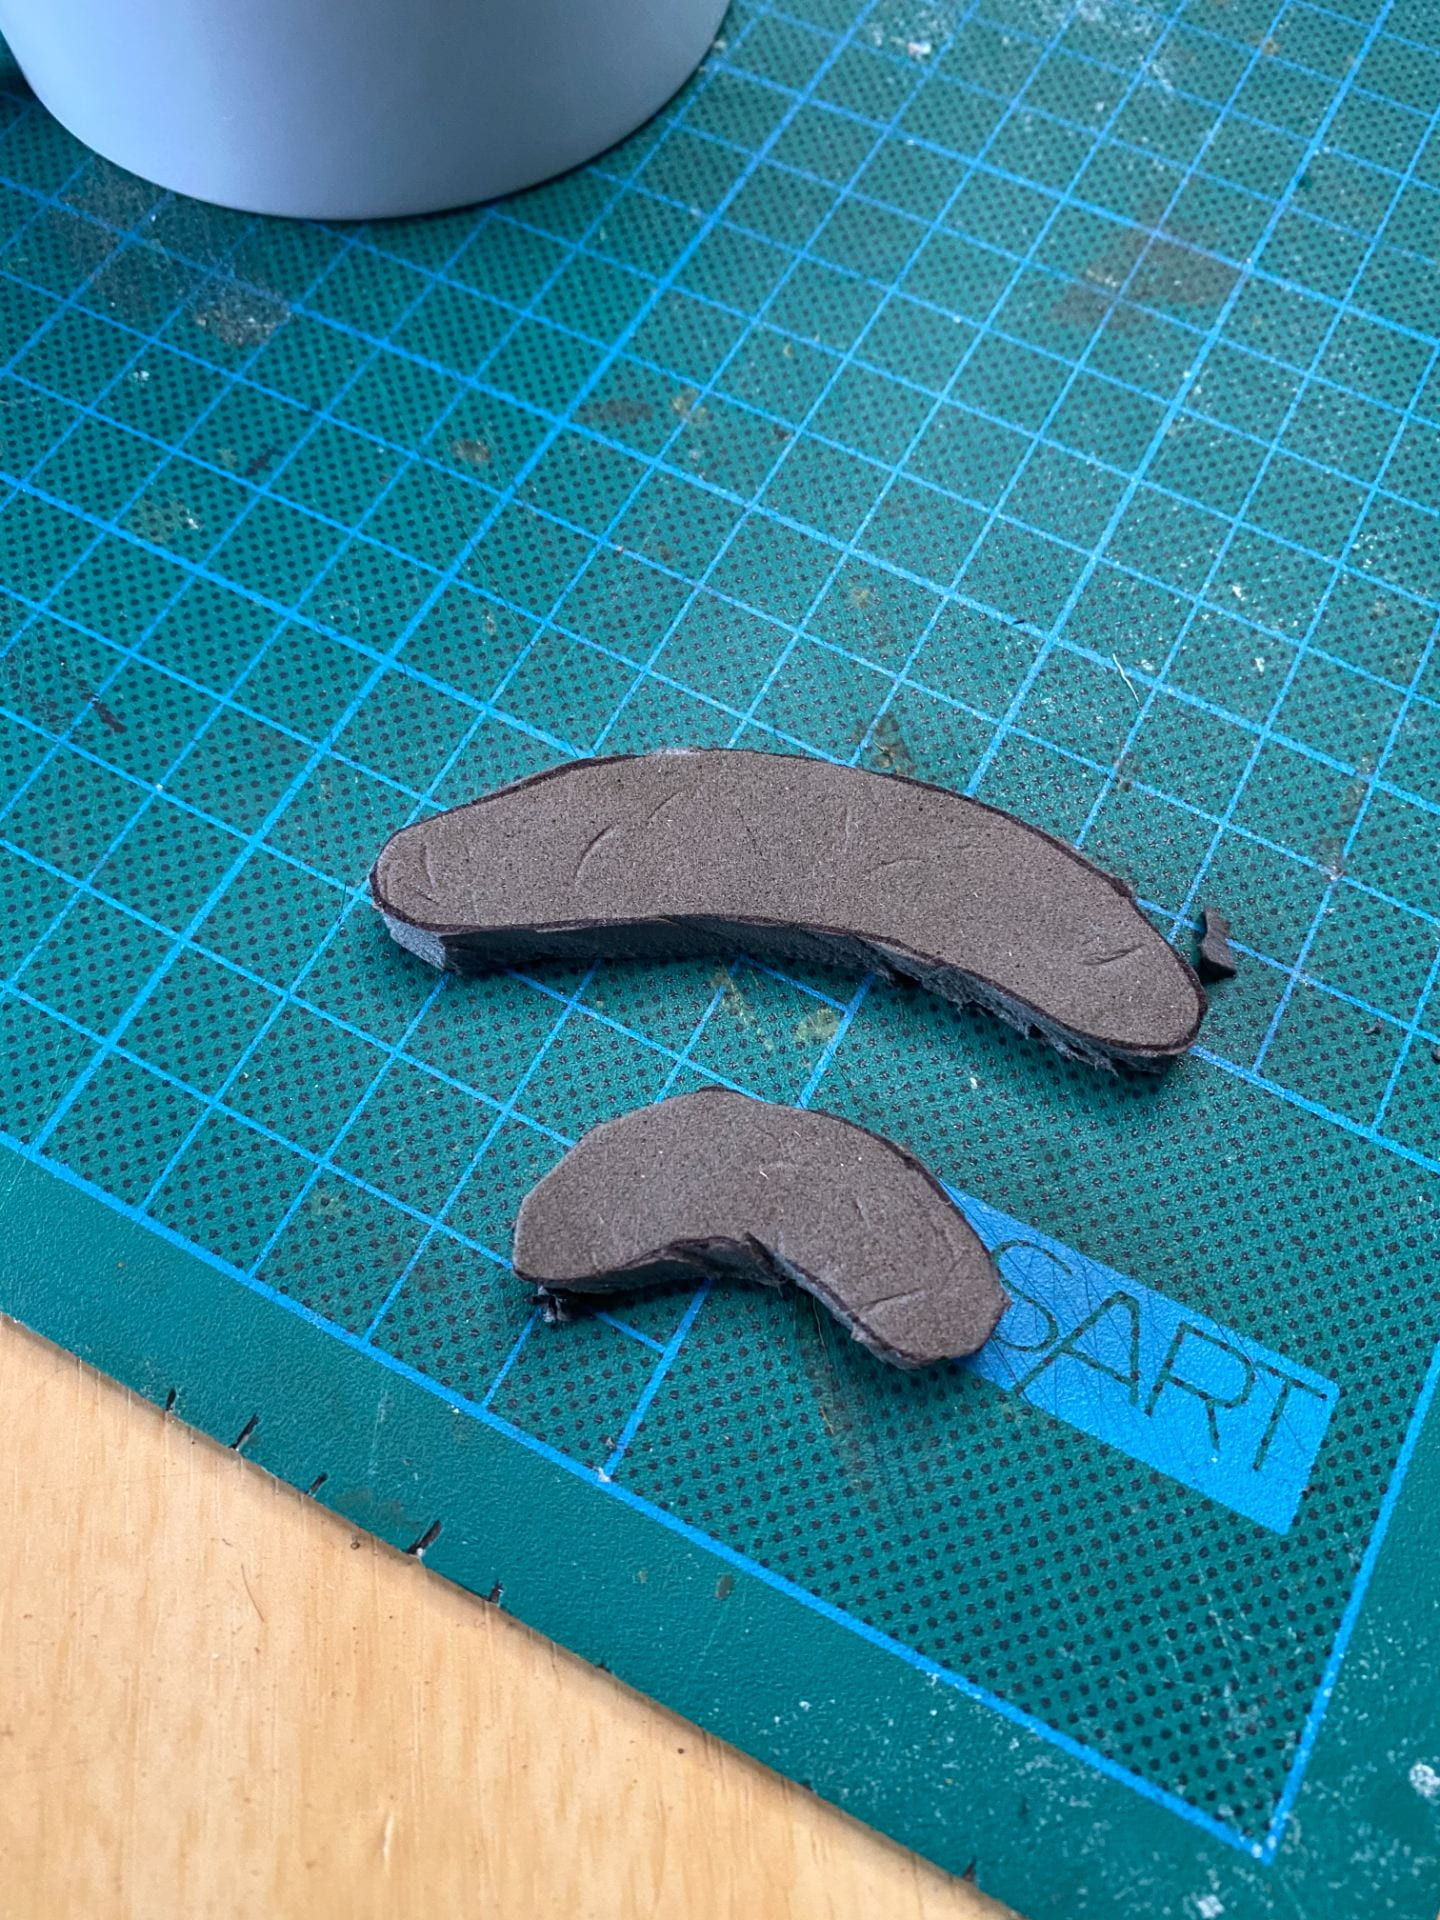 2 black foam peanut shapes